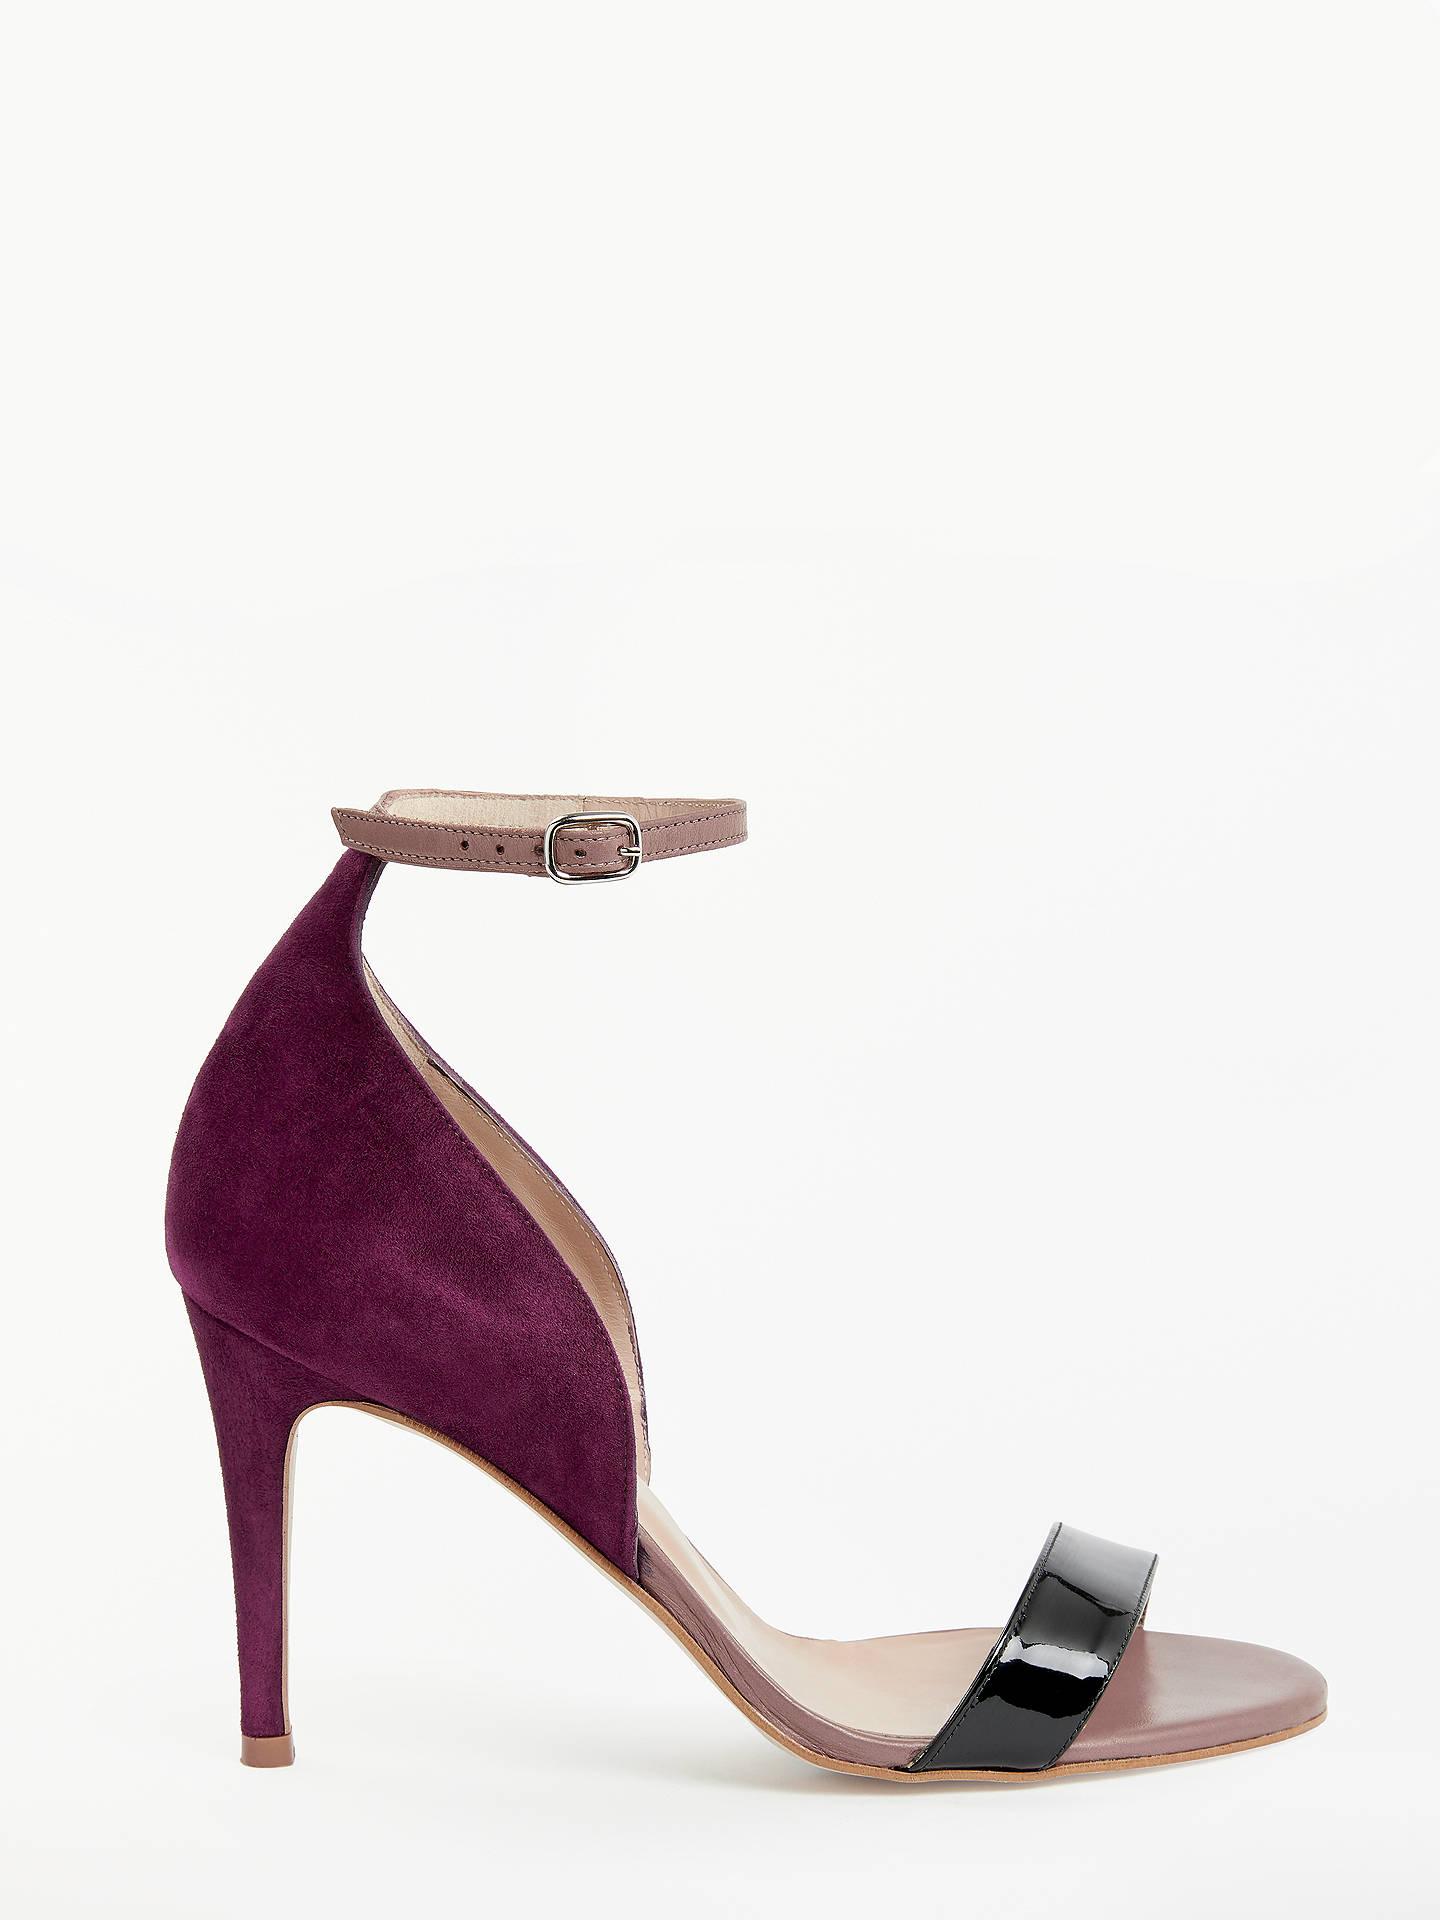 Lewis John high heels latest collection footwear photos